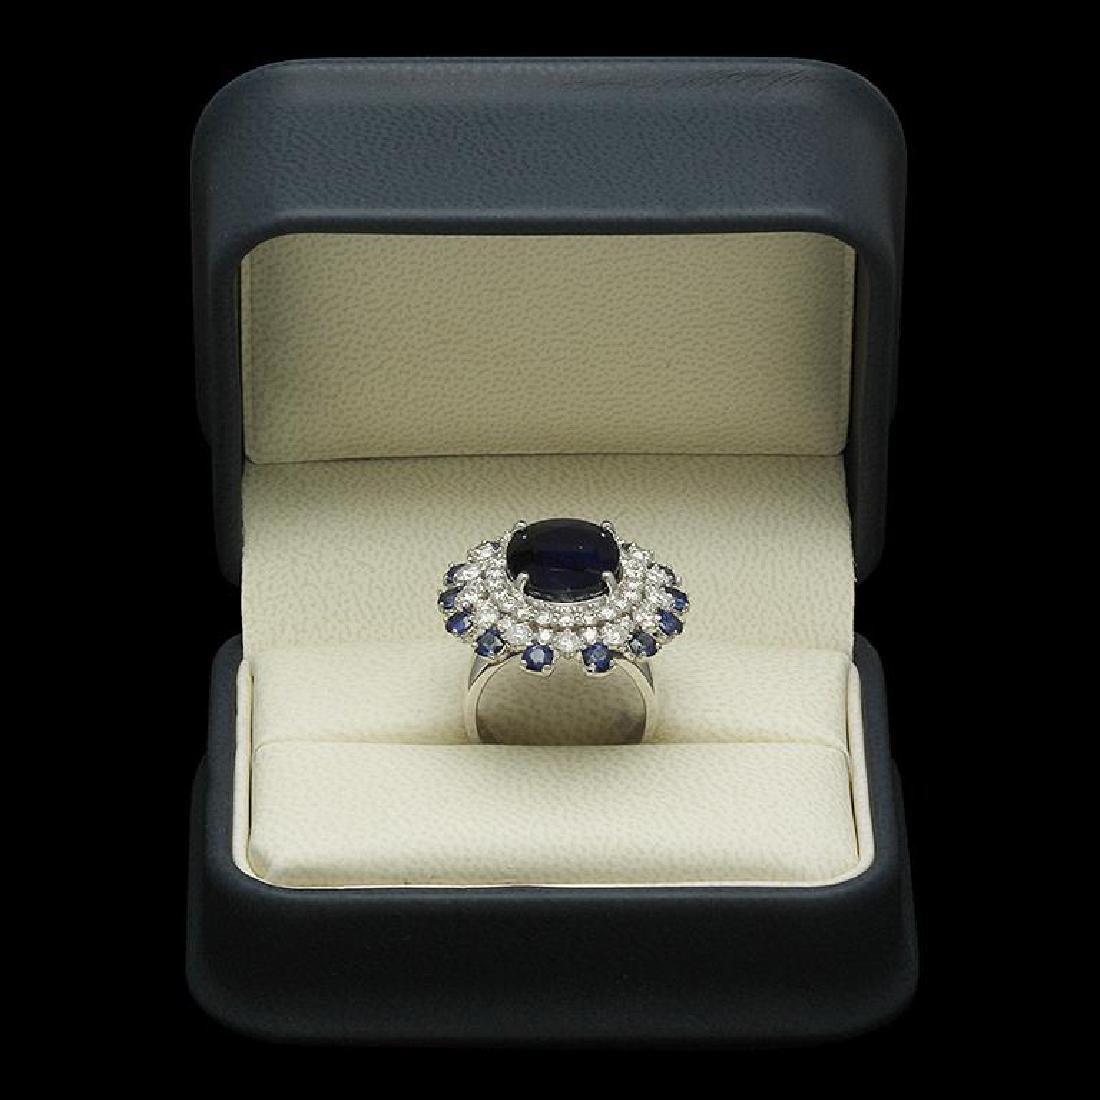 14K Gold 9.97ct Sapphire 2.31ct Diamond Ring - 3